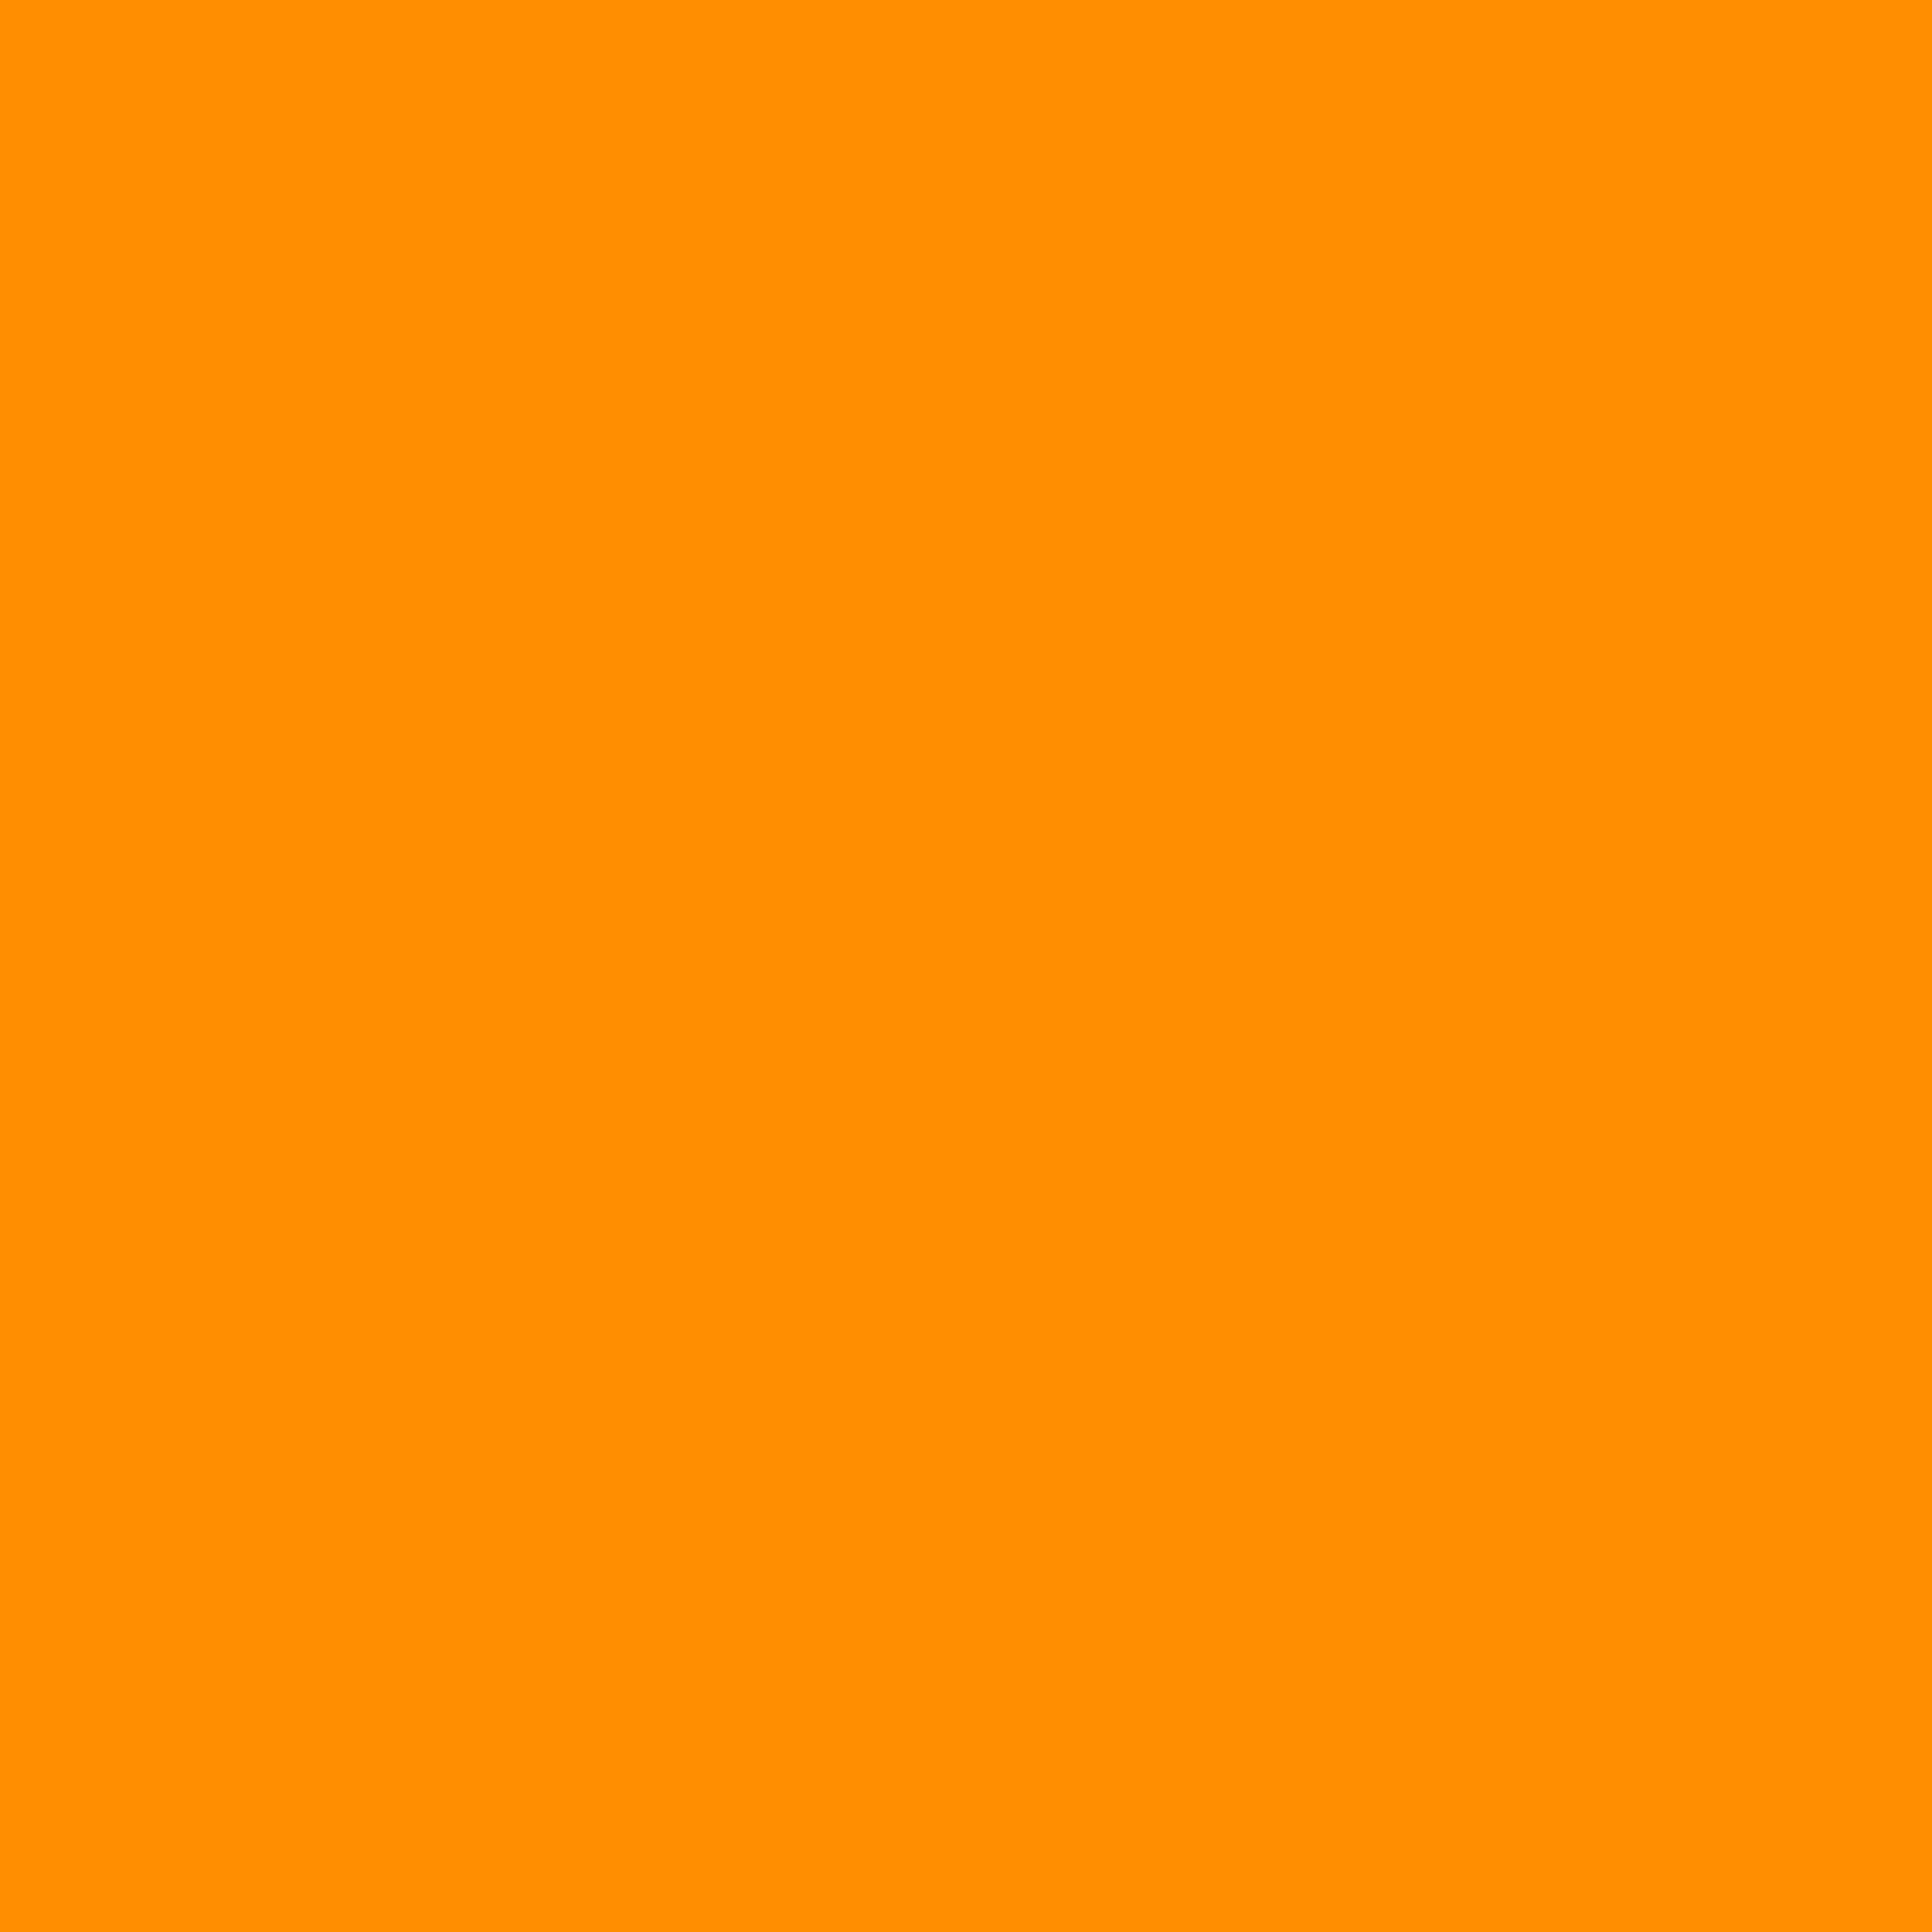 2048x2048 Princeton Orange Solid Color Background